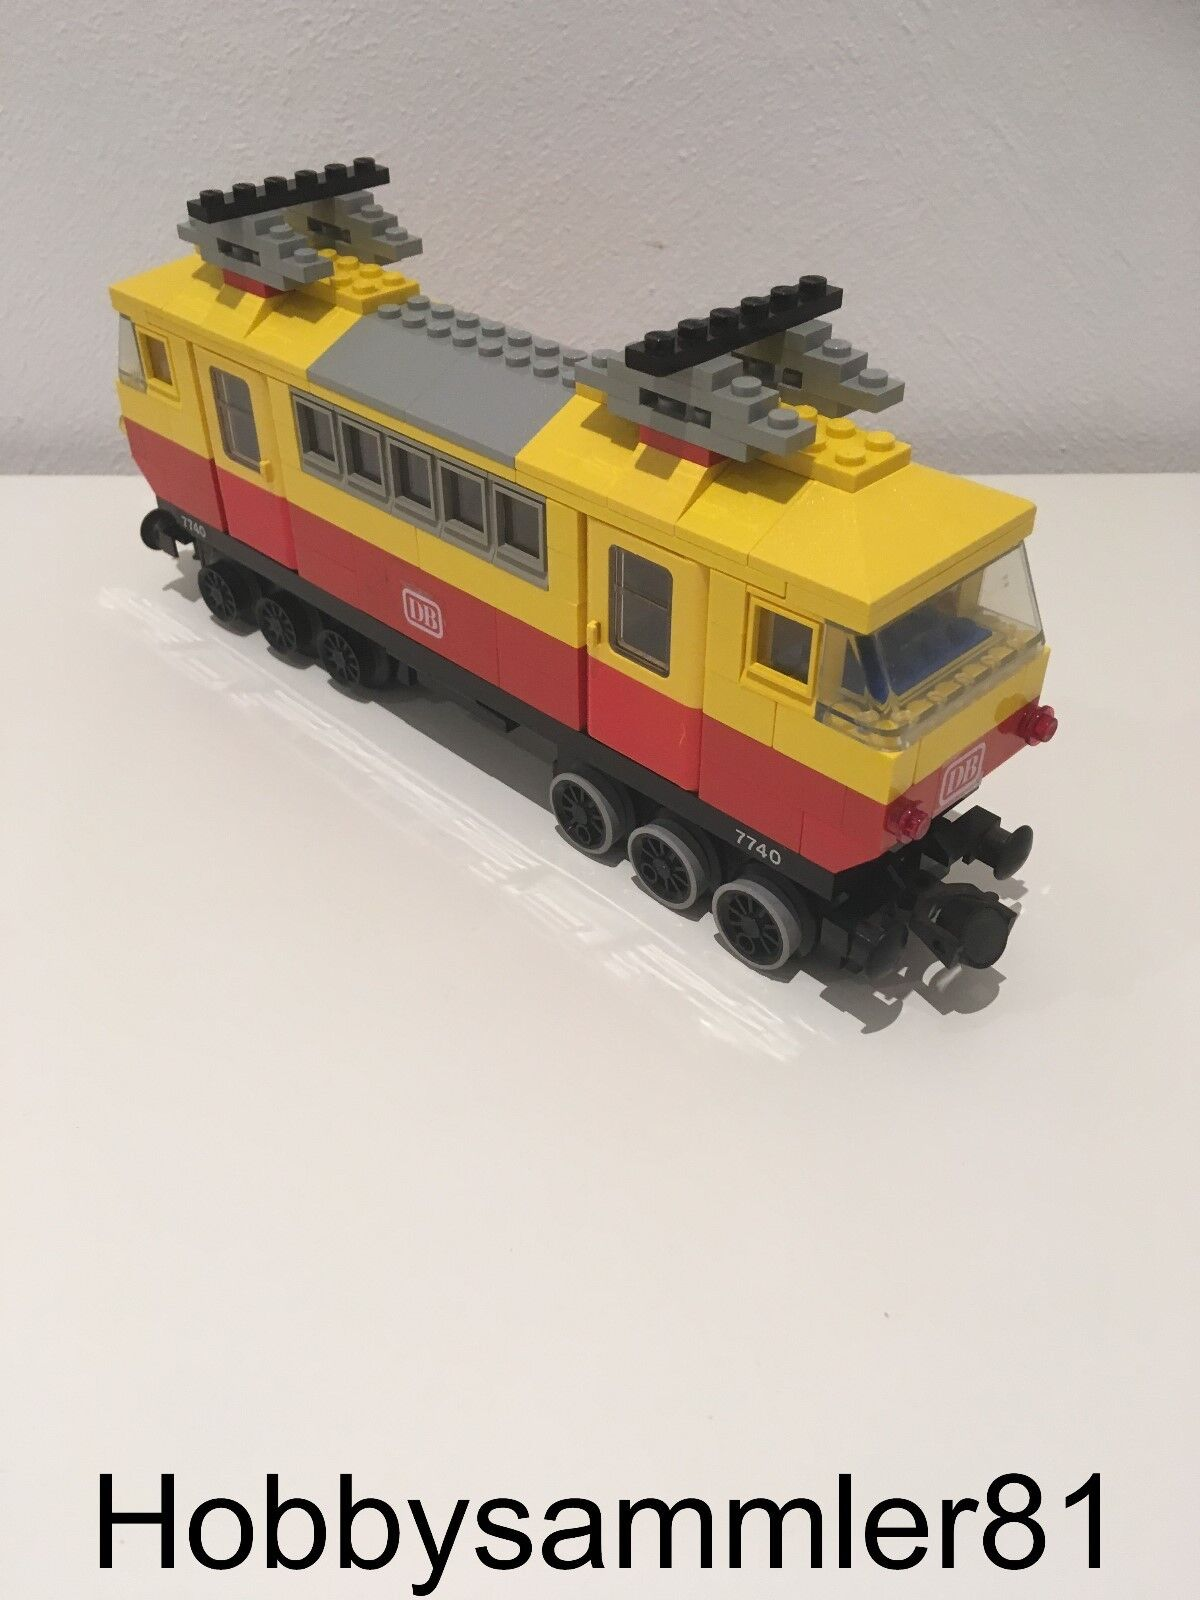 Lego® Personenzug 12V aus 7740 / Zug / Lok / Lokomotive / Eisenbahn / Bahn